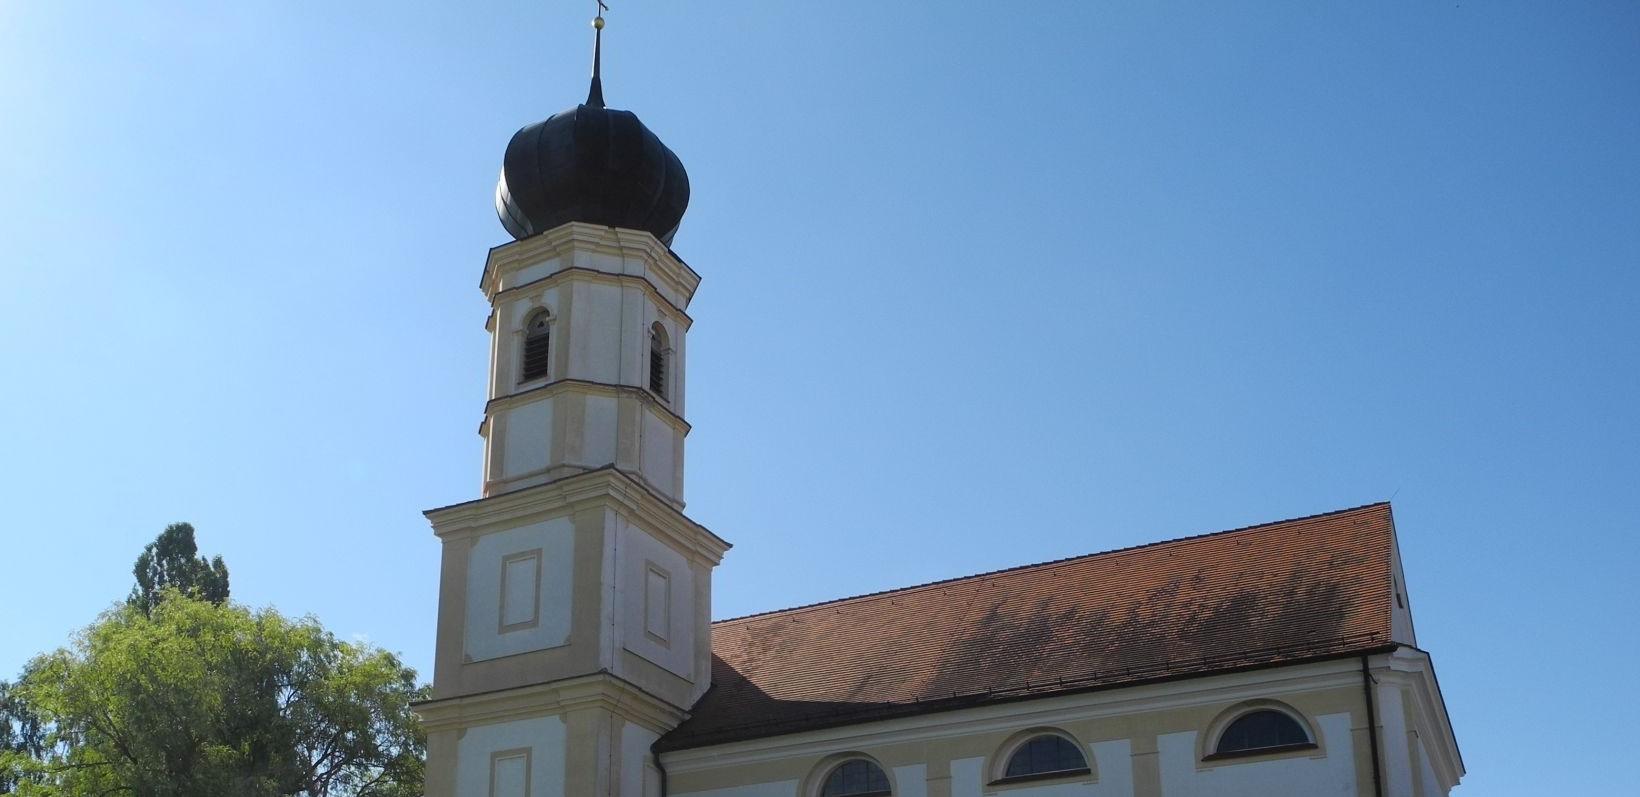 Wallfahrtskirche Hellring Langquaid